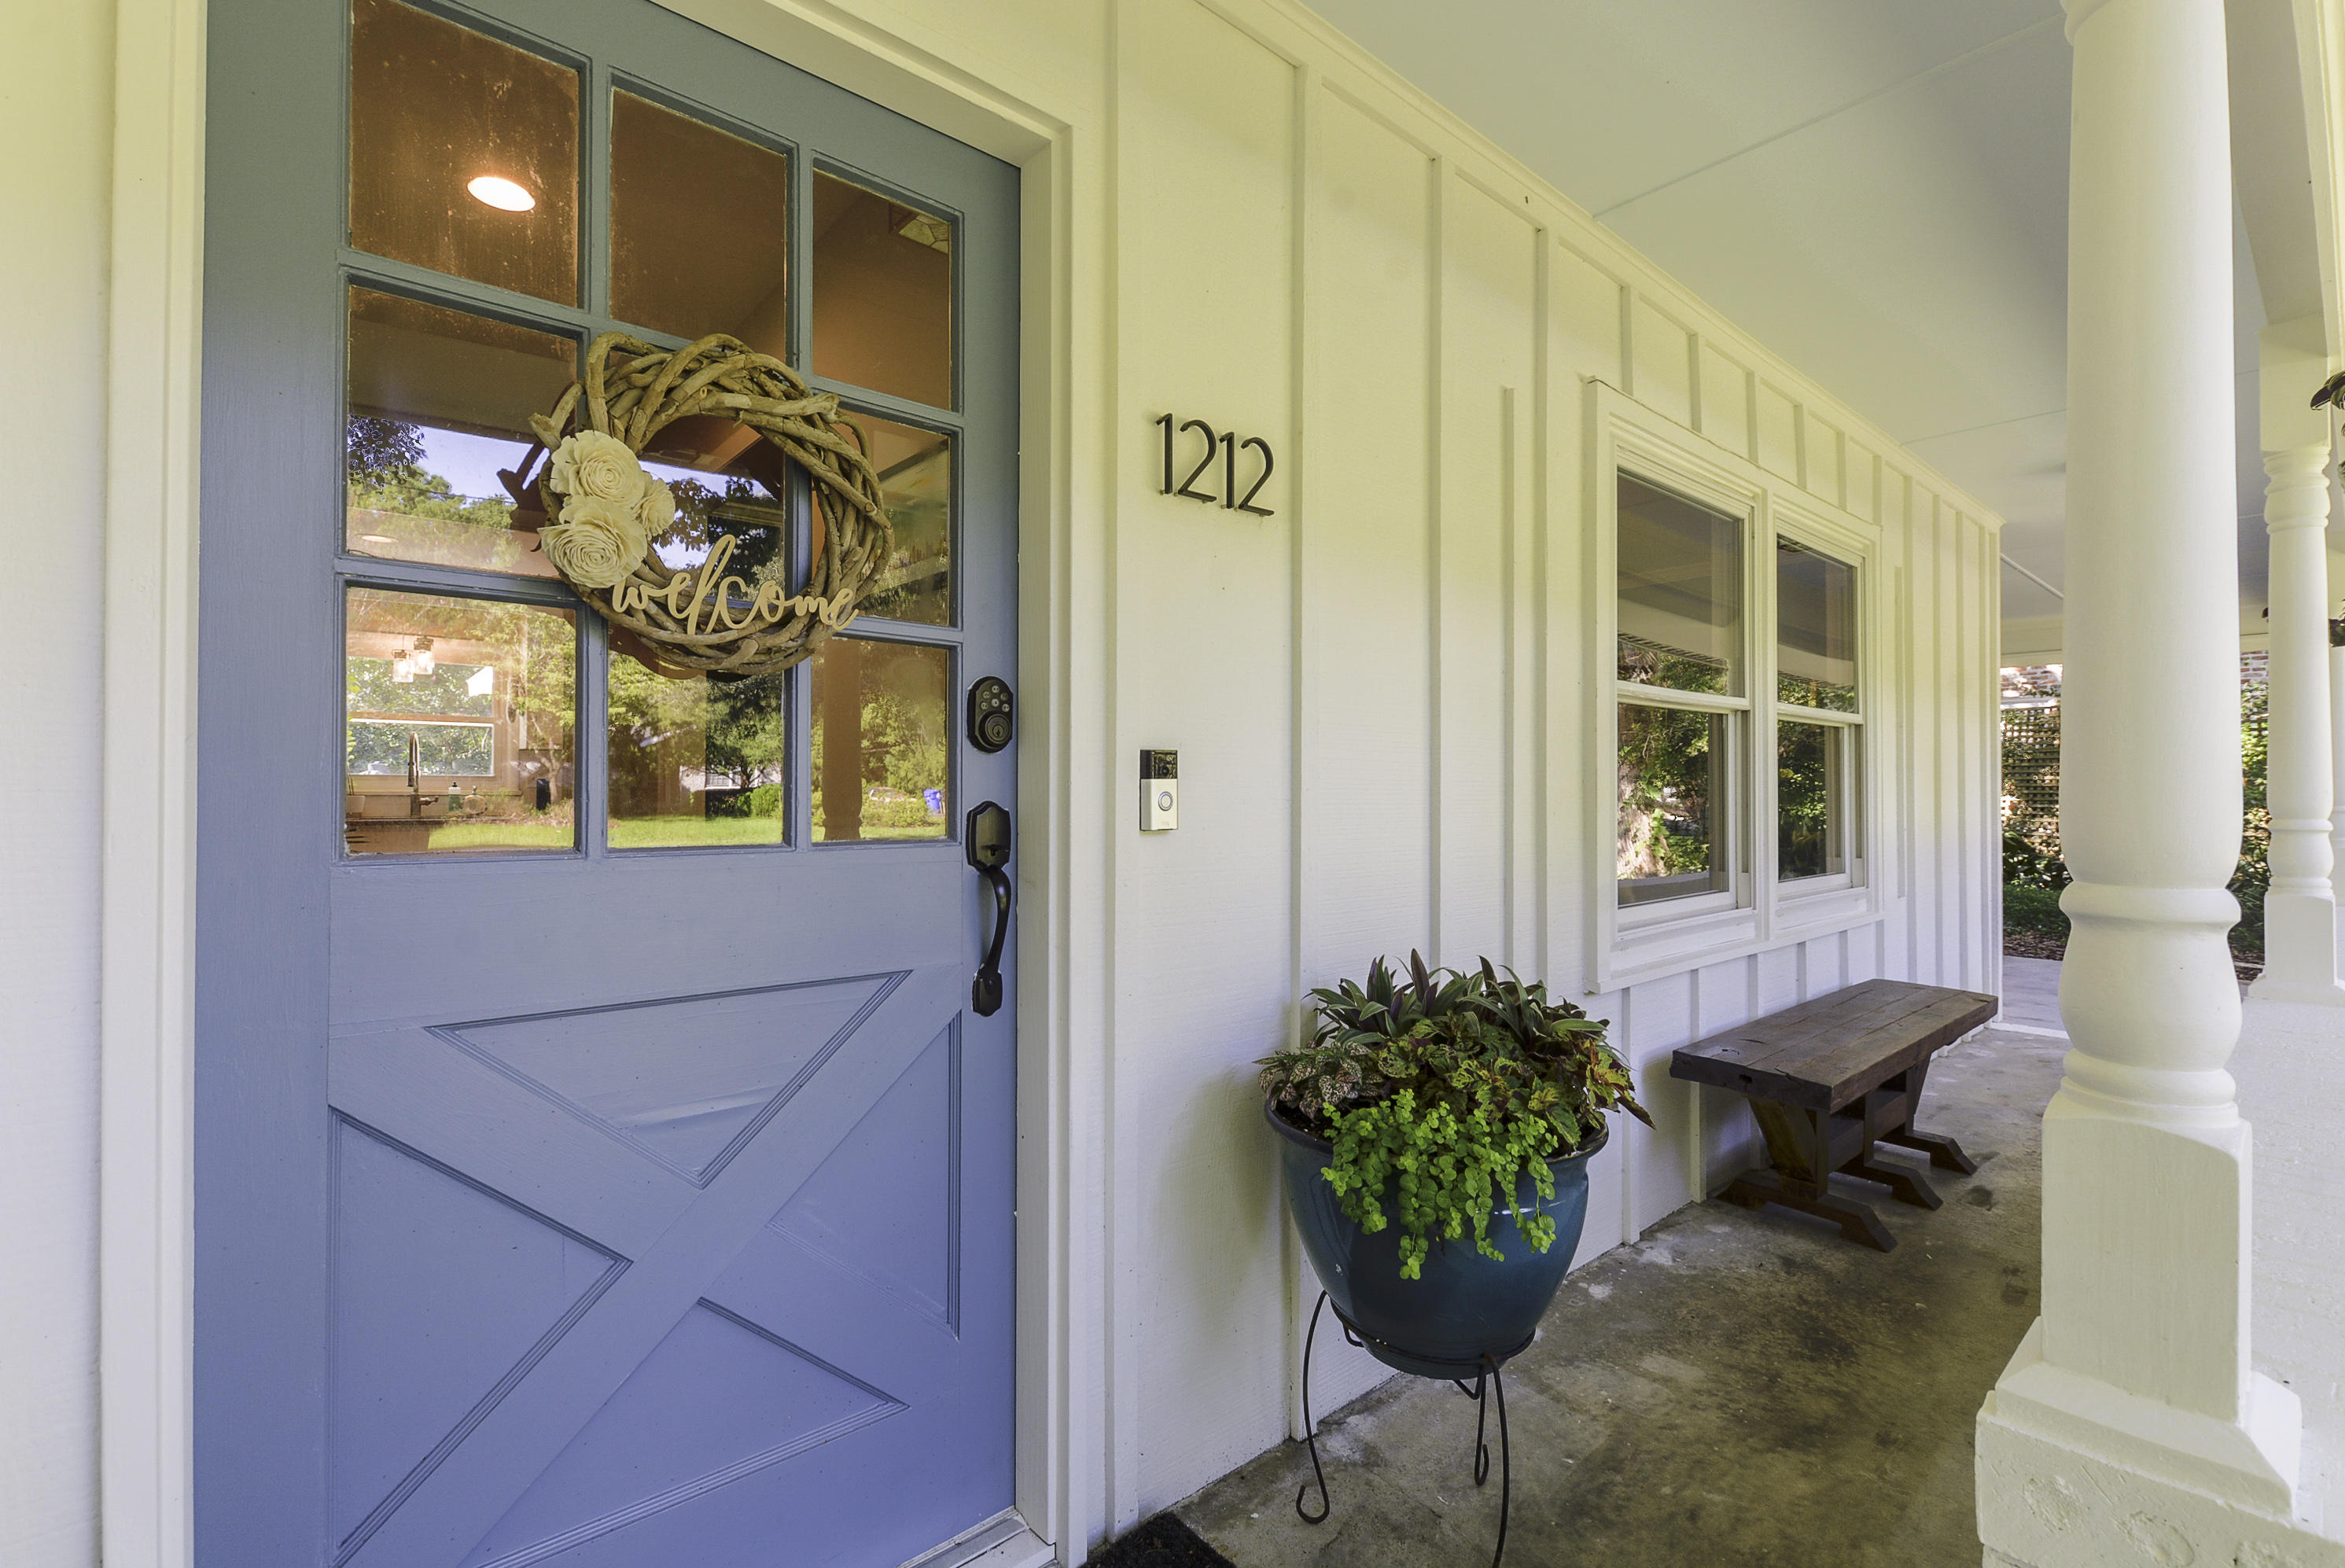 Avian Park Homes For Sale - 1212 Penny, Mount Pleasant, SC - 2